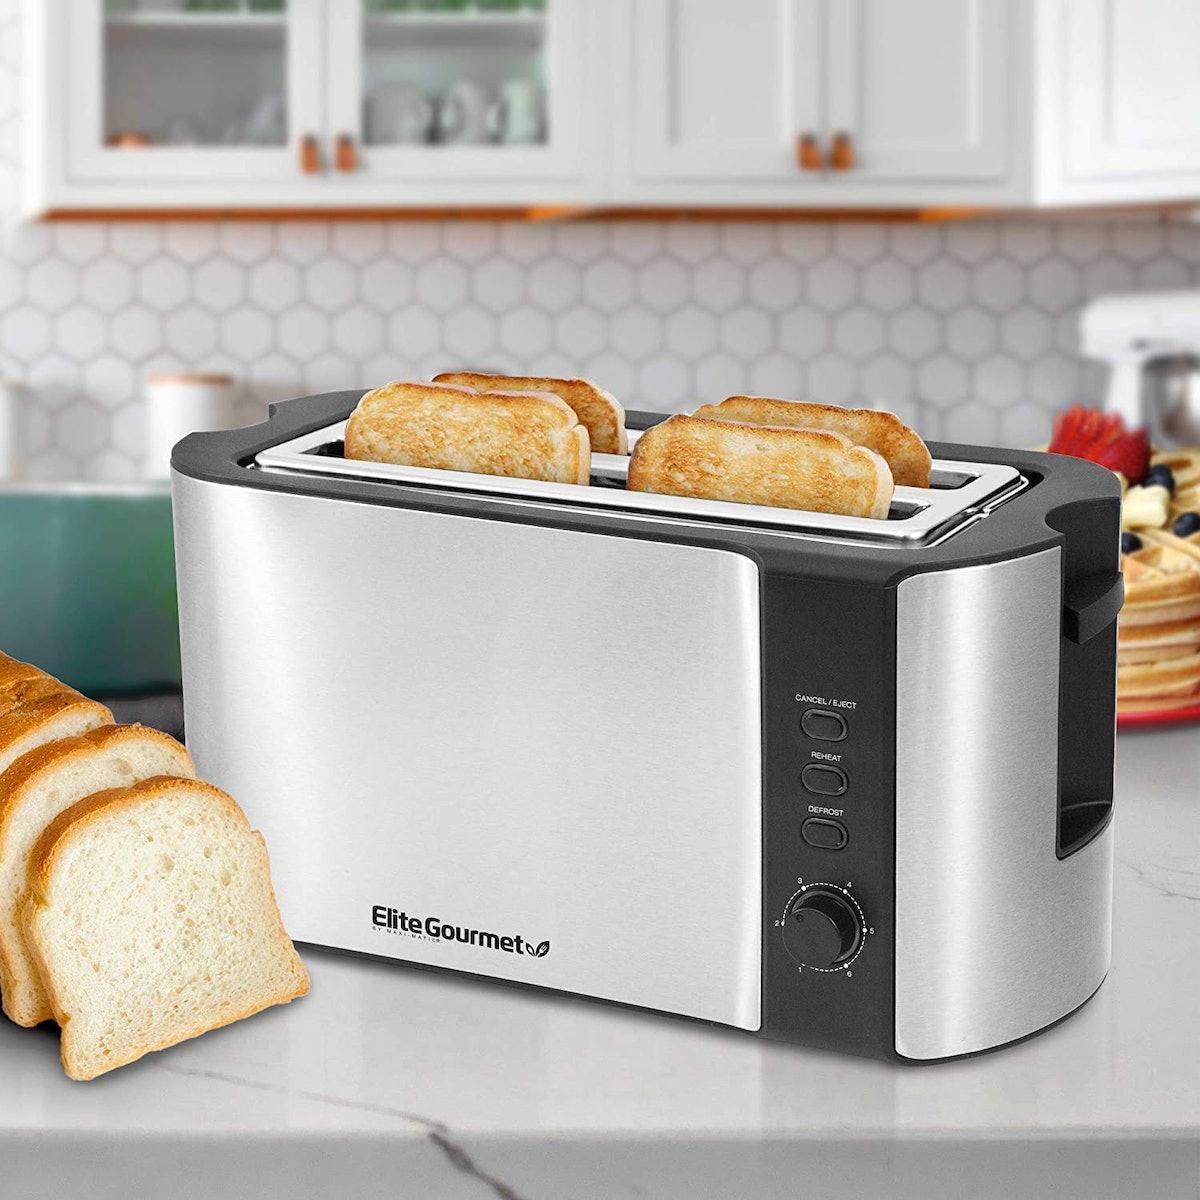 Elite Gourmet 4-Slice Toaster